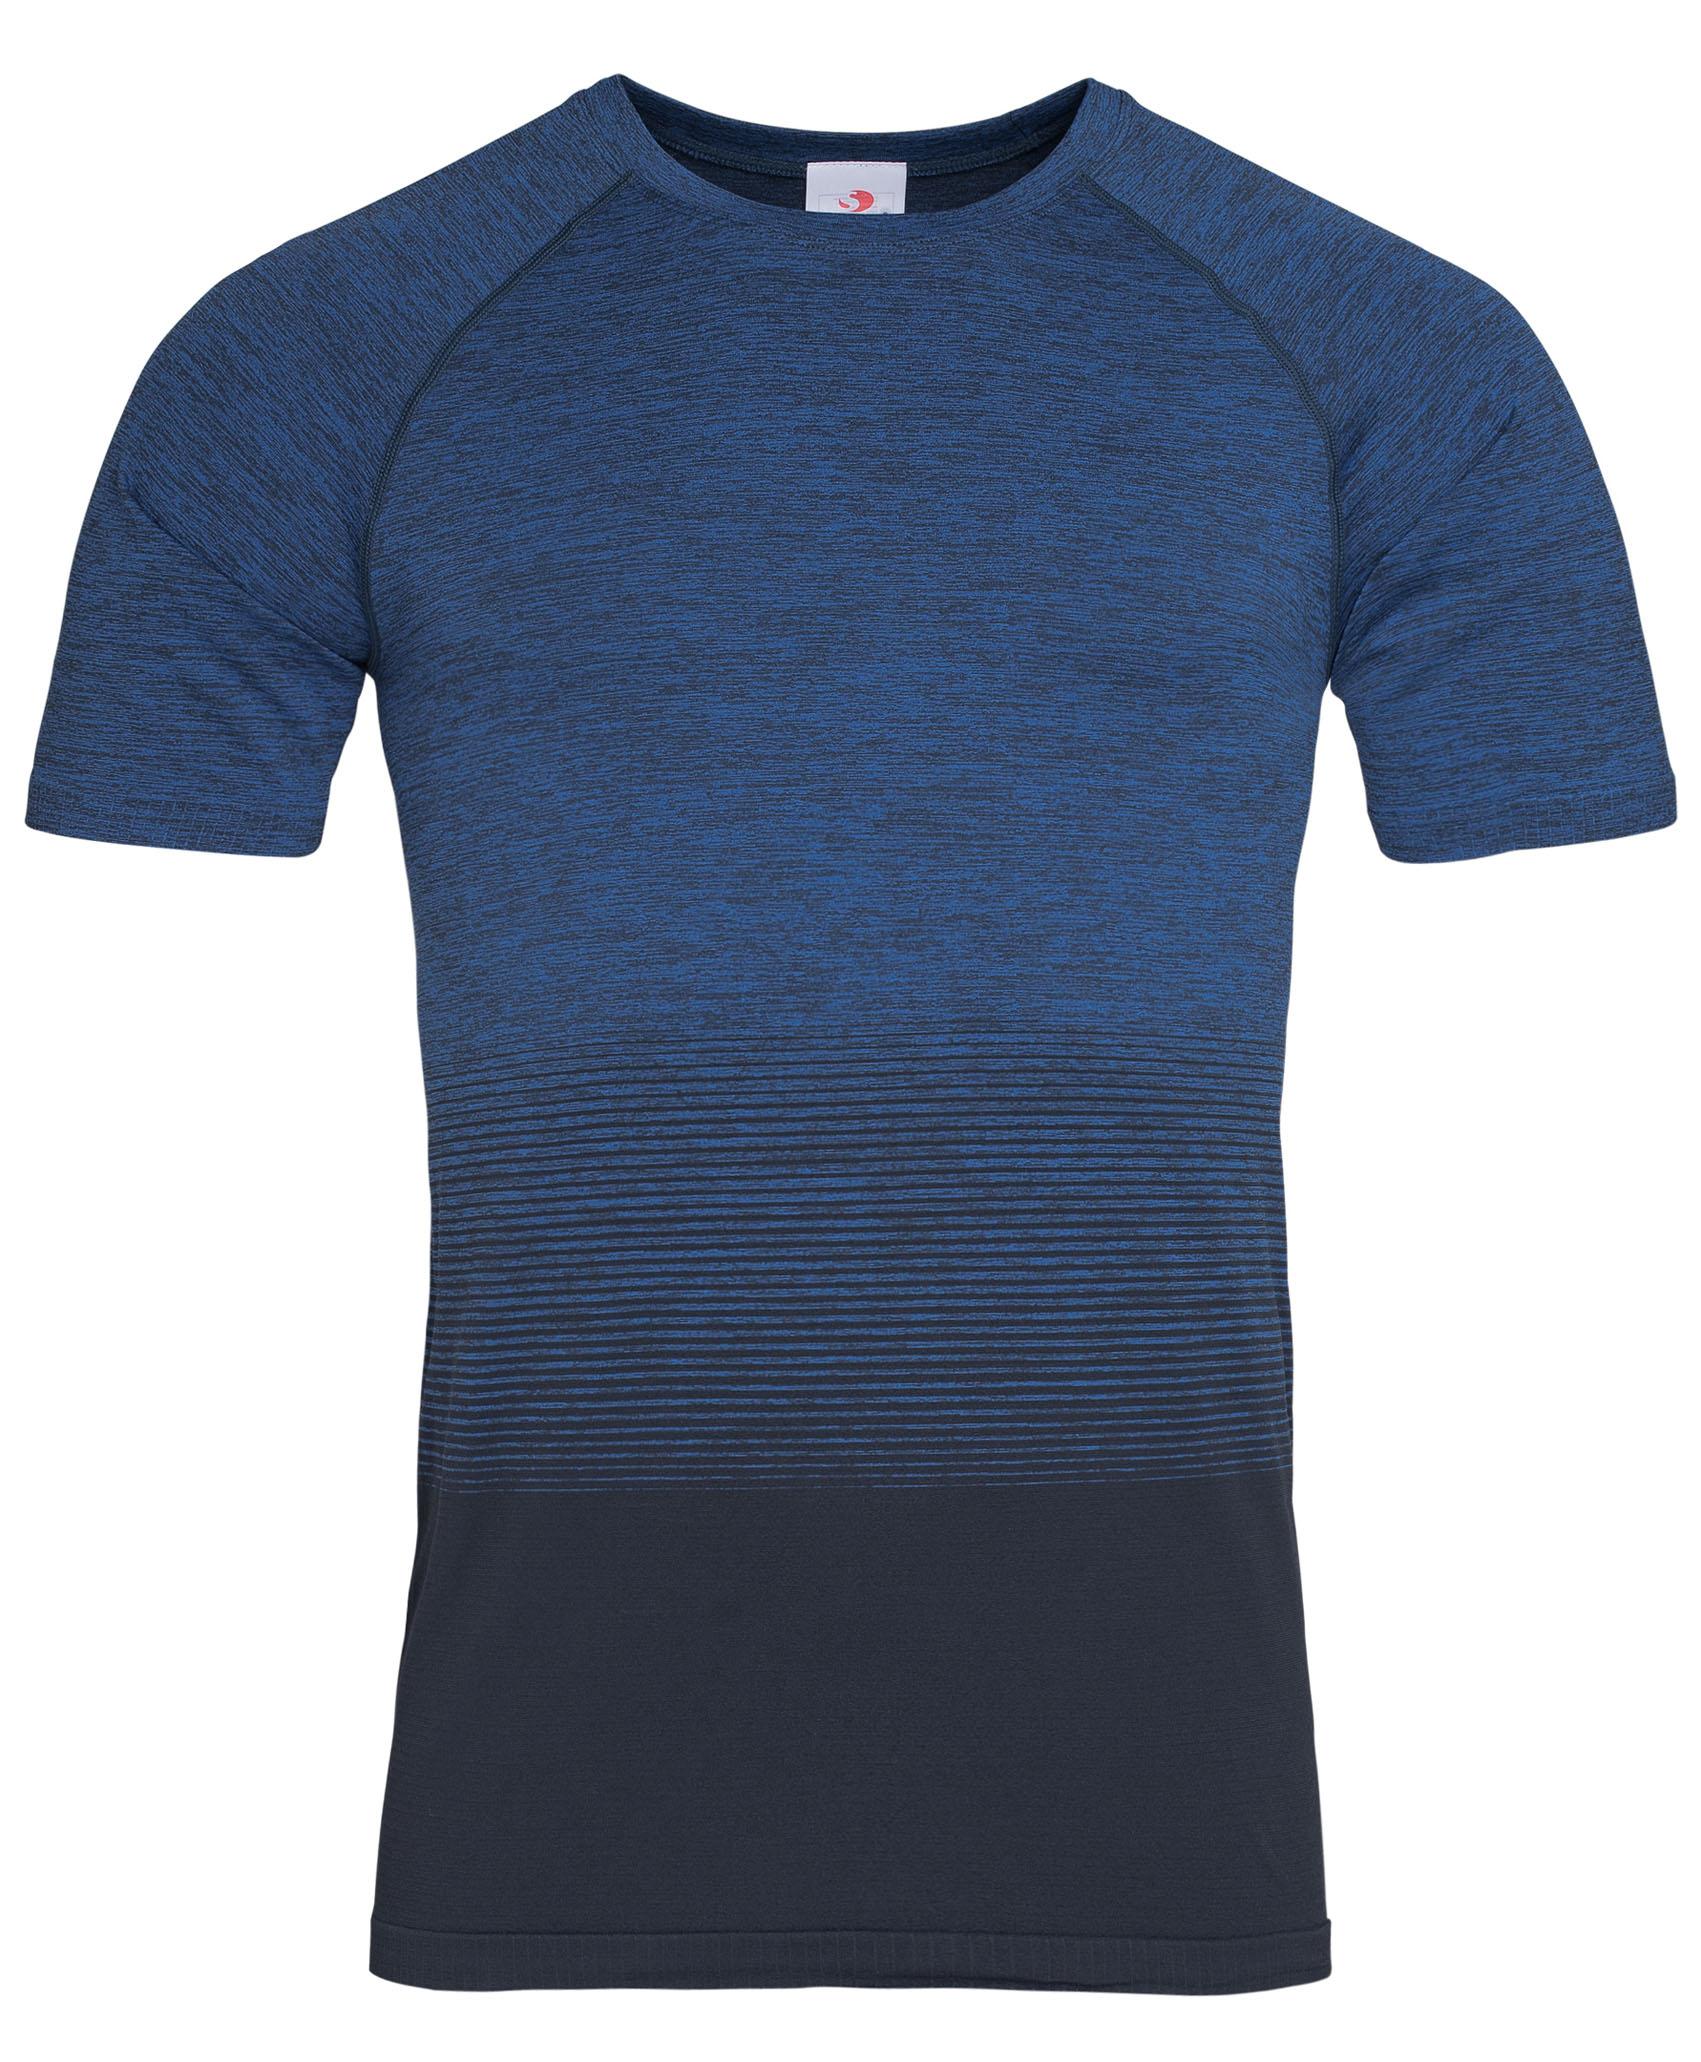 Stedman T-shirt seamless raglan for him